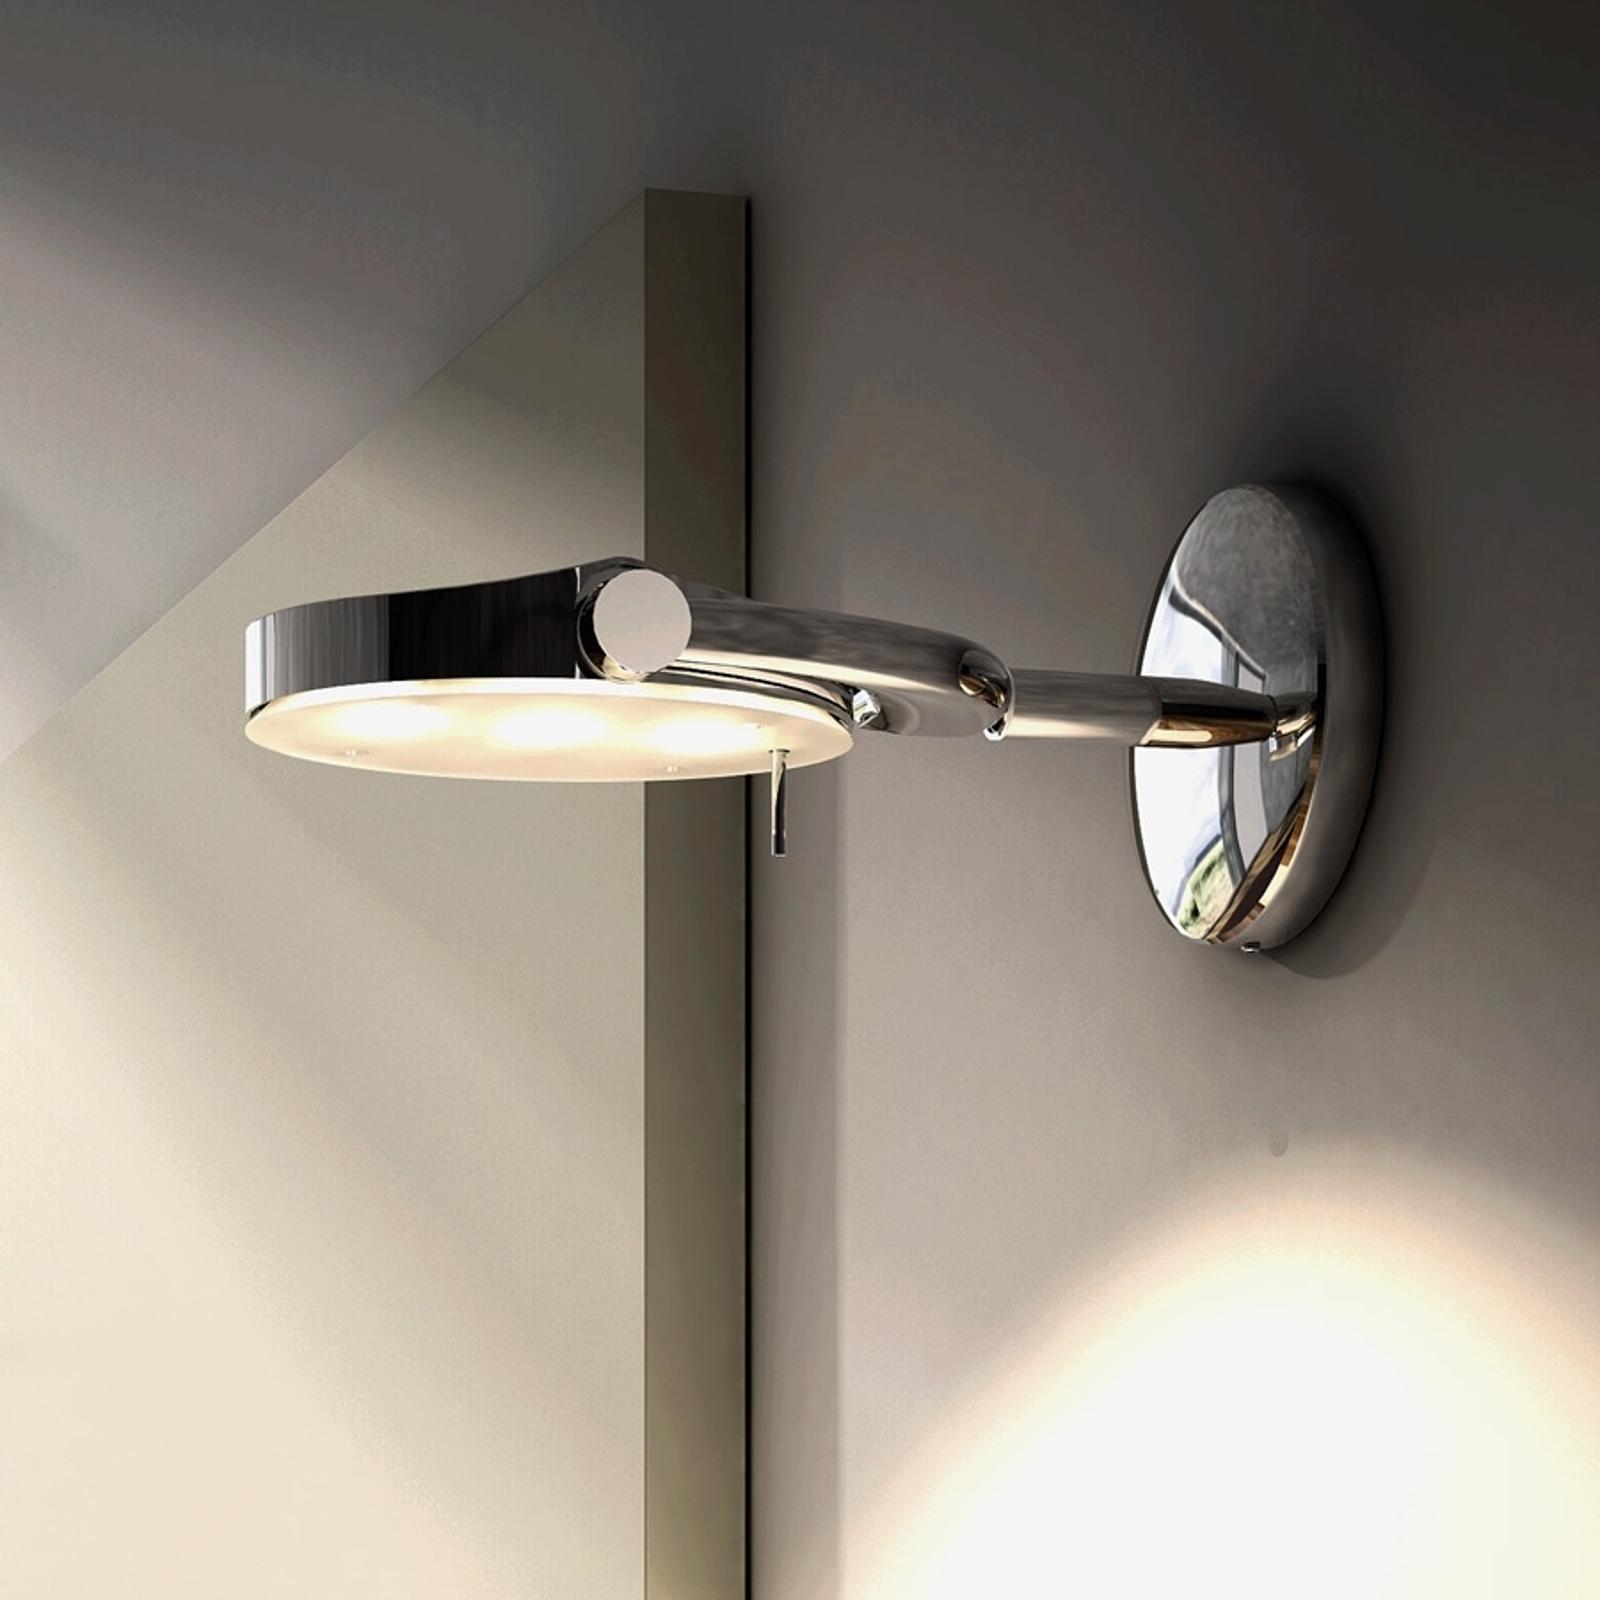 Regulowana lampa ścienna LED PERCEVAL, mała